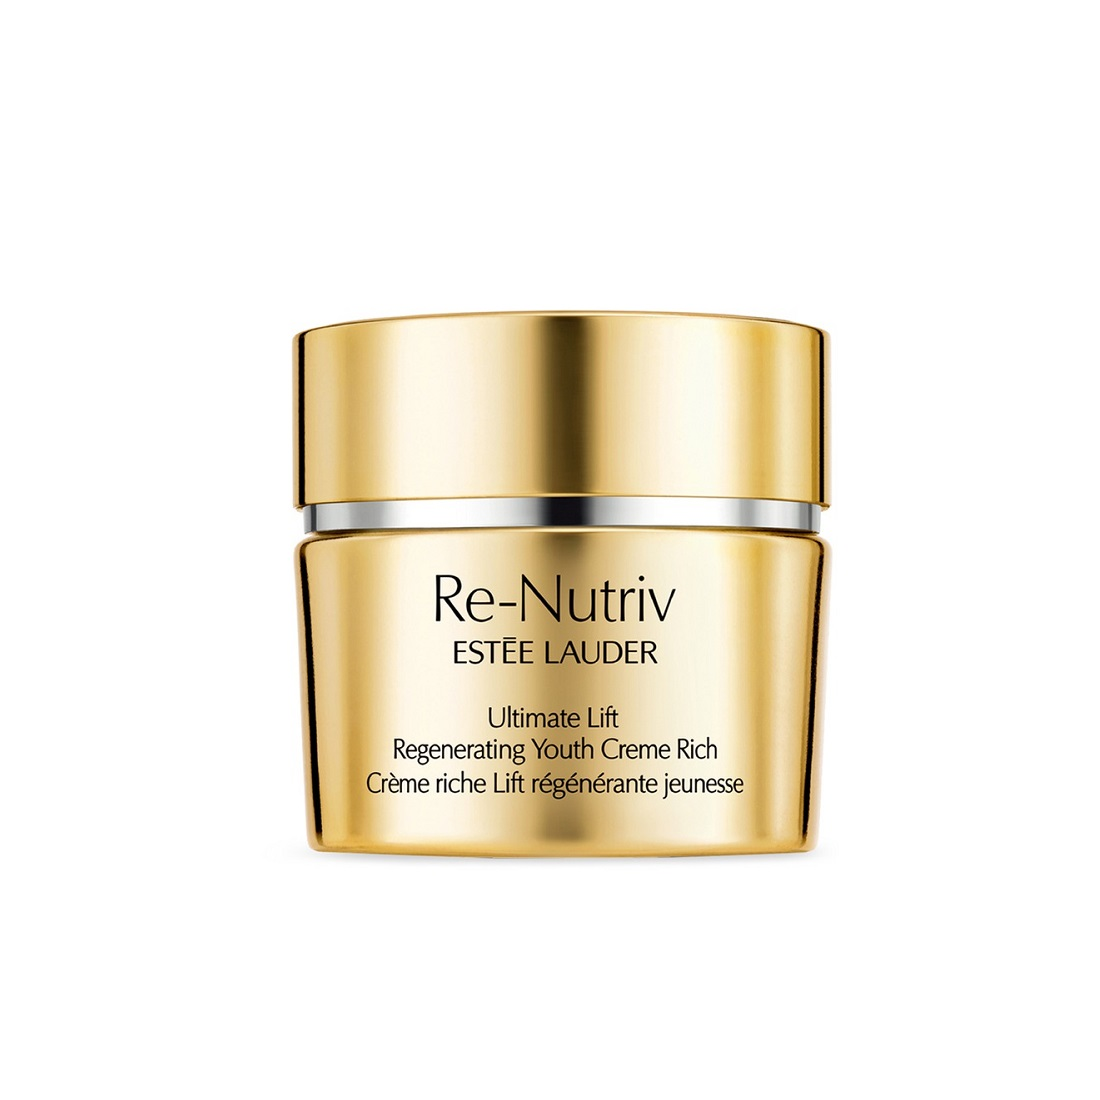 Estée Lauder RE-NUTRIV Ultimate Lift Regenerating Youth Creme Rich 50ml Τύπος Δέρματος : Όλοι οι τύποι